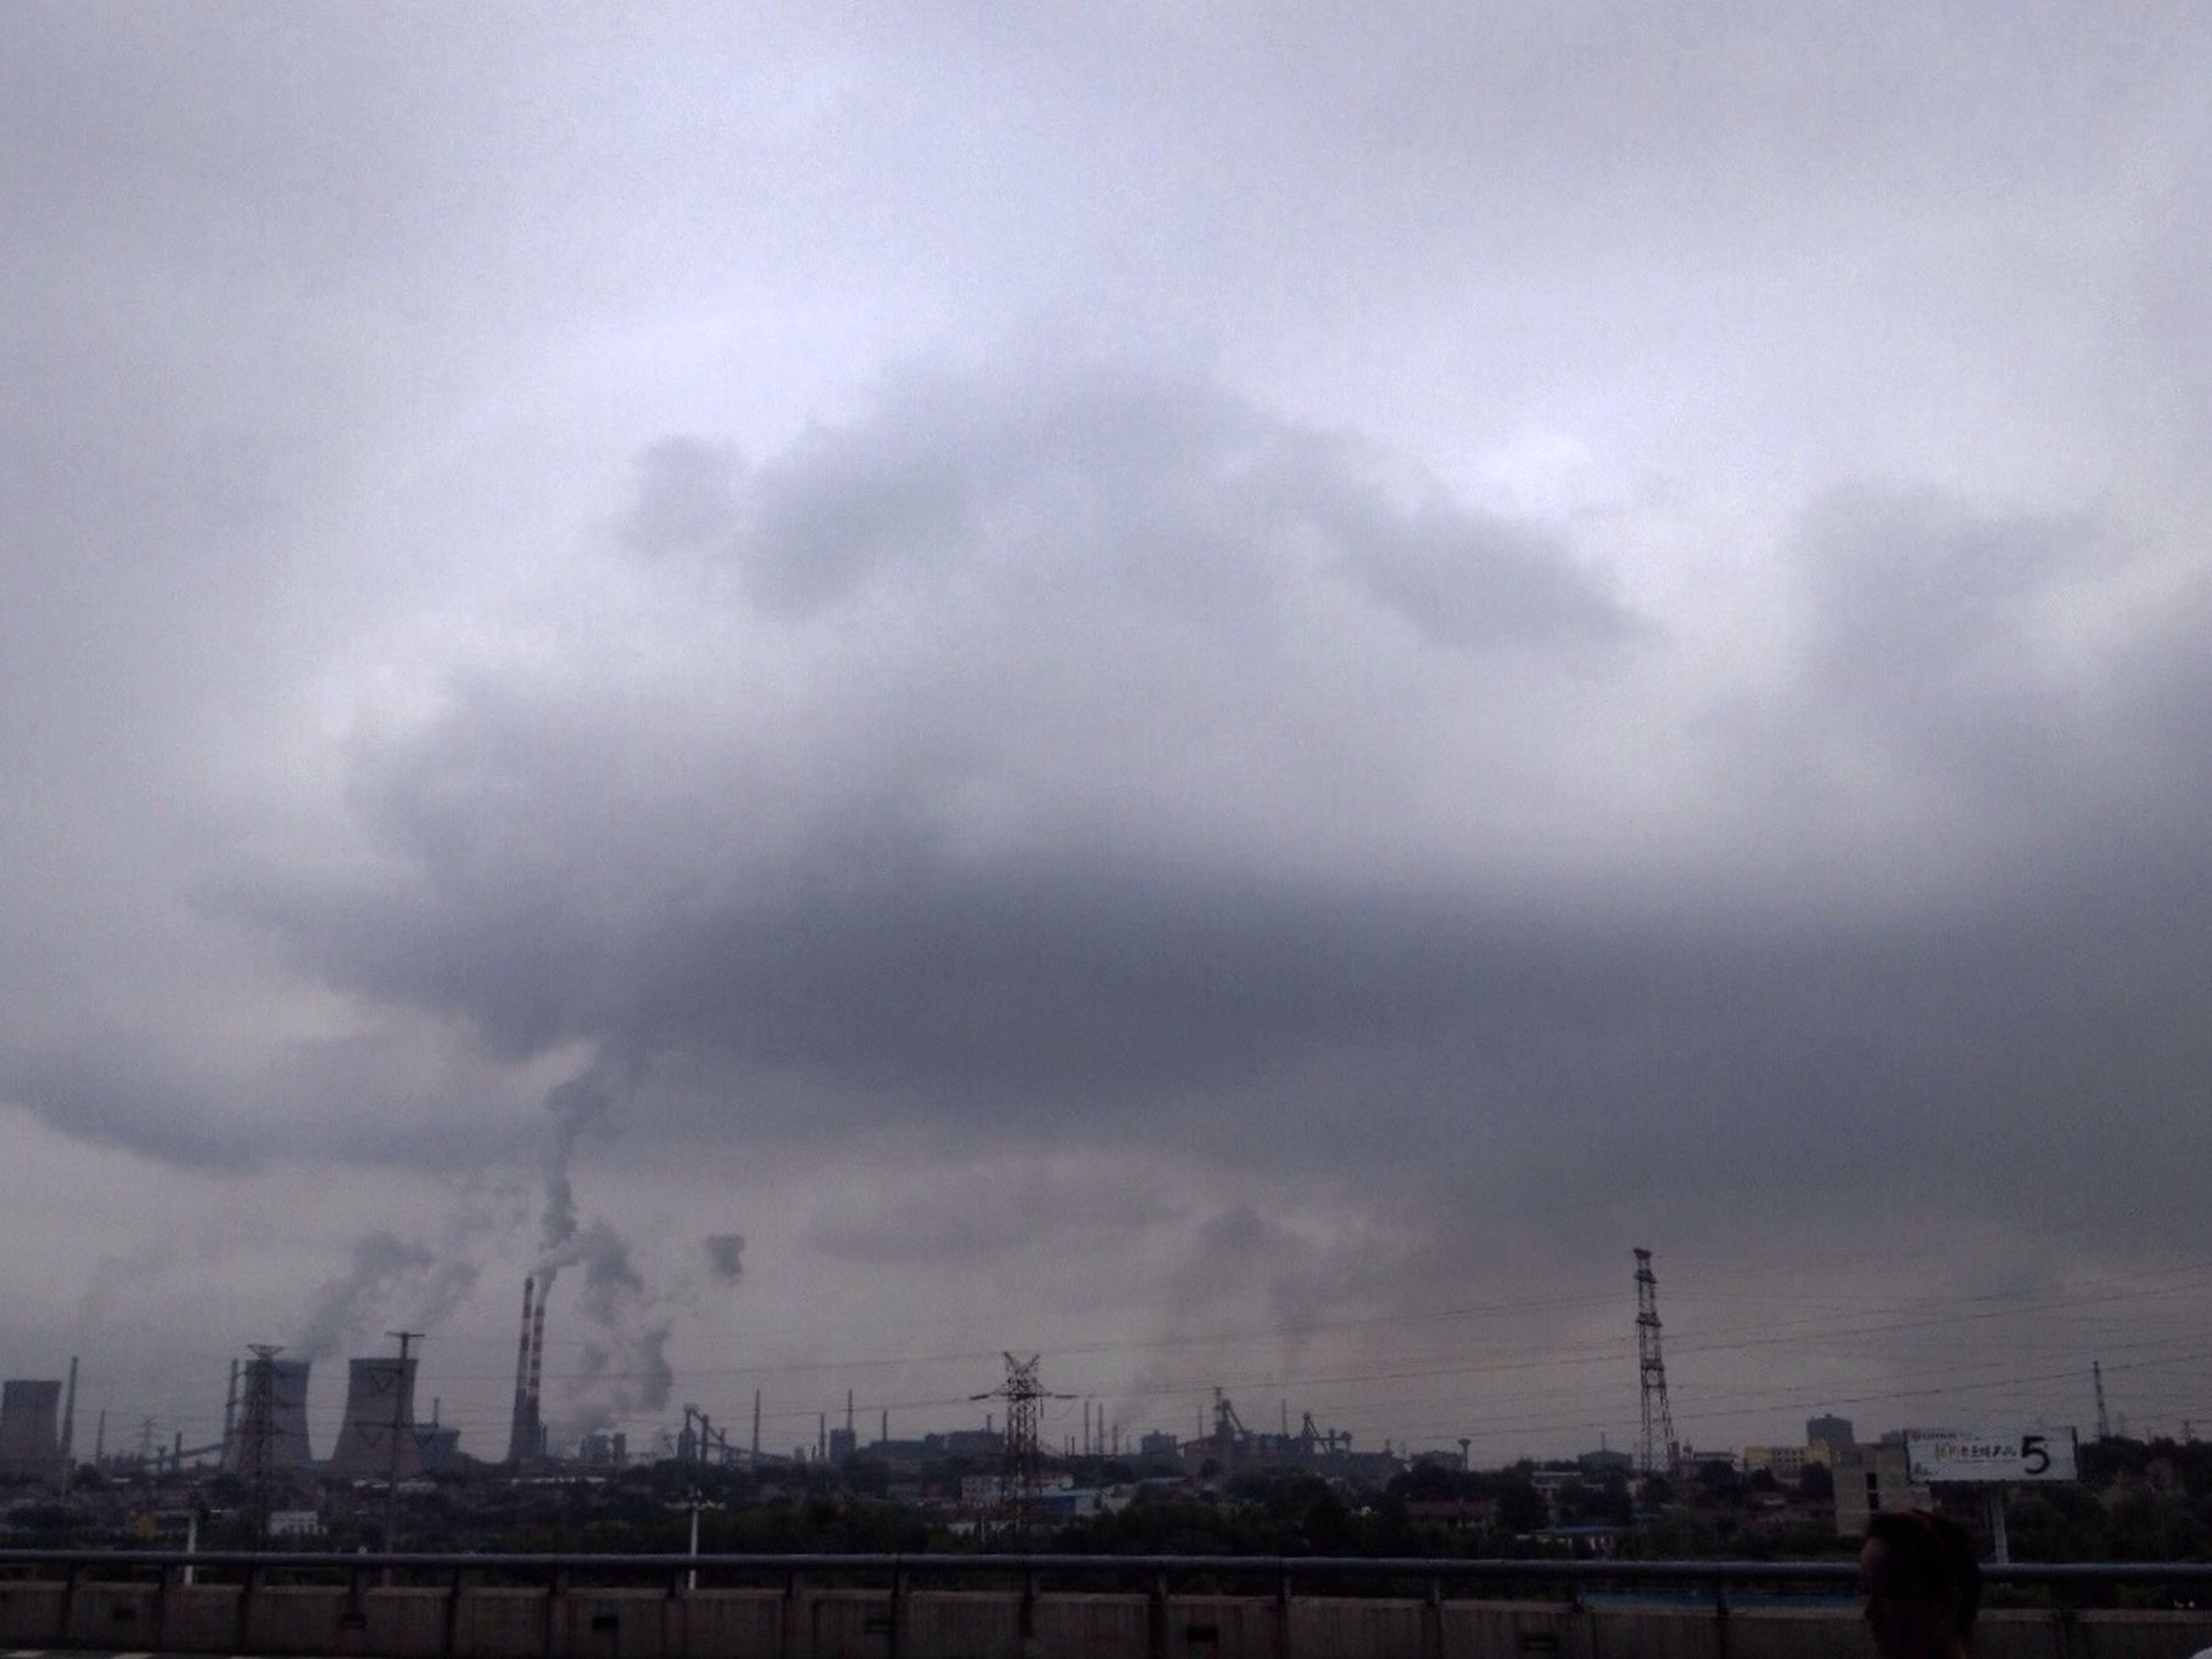 sky, cloud - sky, built structure, architecture, cloudy, building exterior, weather, overcast, city, cloud, development, outdoors, cityscape, dusk, day, no people, storm cloud, nature, connection, industry